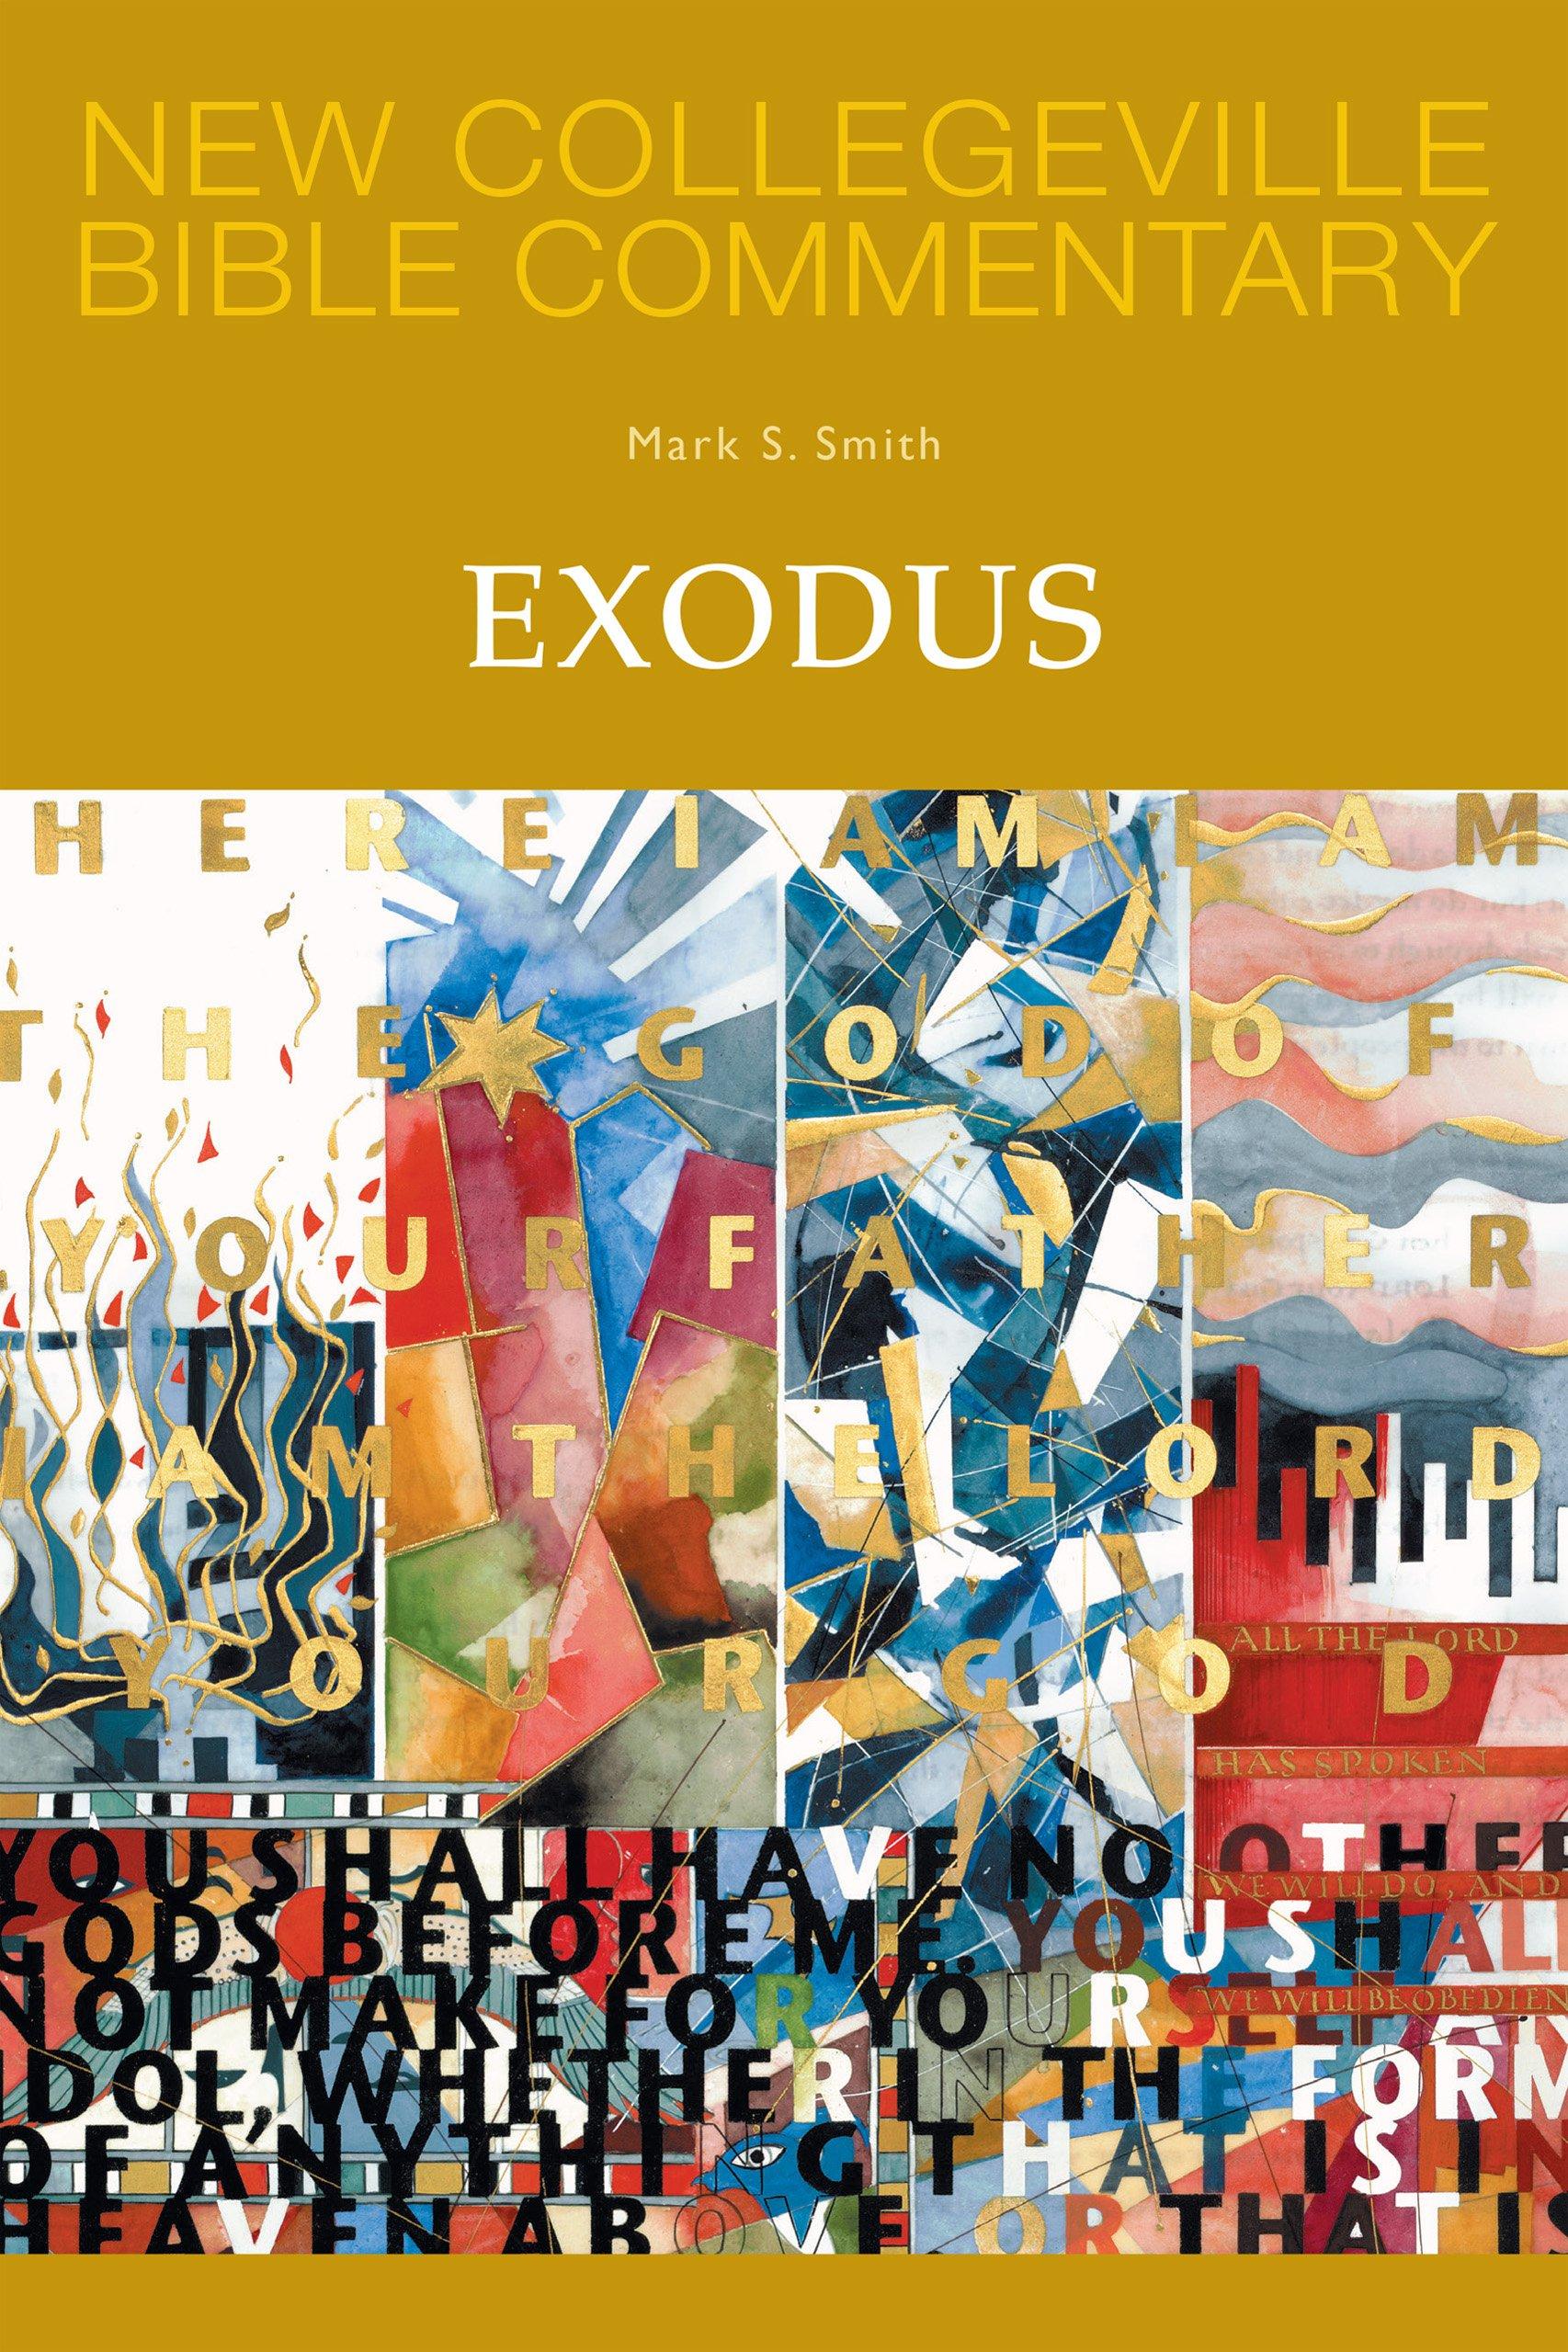 Exodus volume 3 new collegeville bible commentary old testament exodus volume 3 new collegeville bible commentary old testament mark s smith 9780814628379 amazon books fandeluxe Gallery